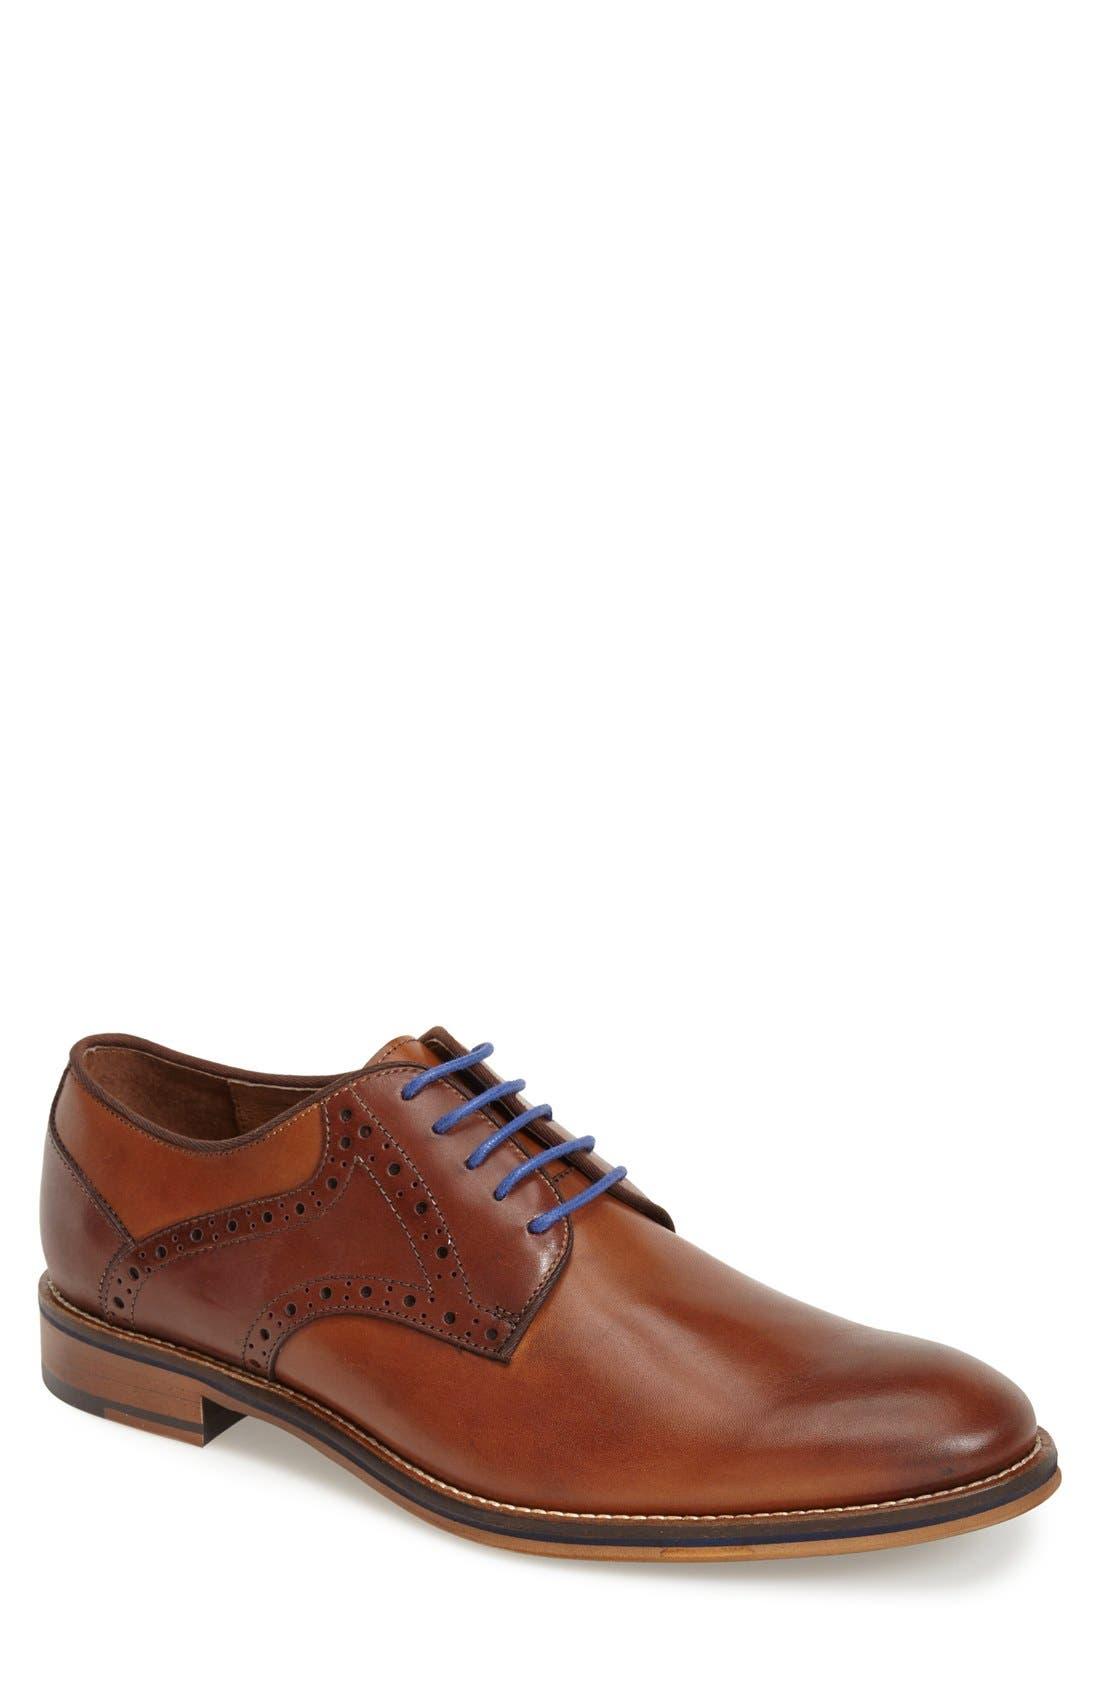 Johnston & Murphy 'Conard' Saddle Shoe (Men)